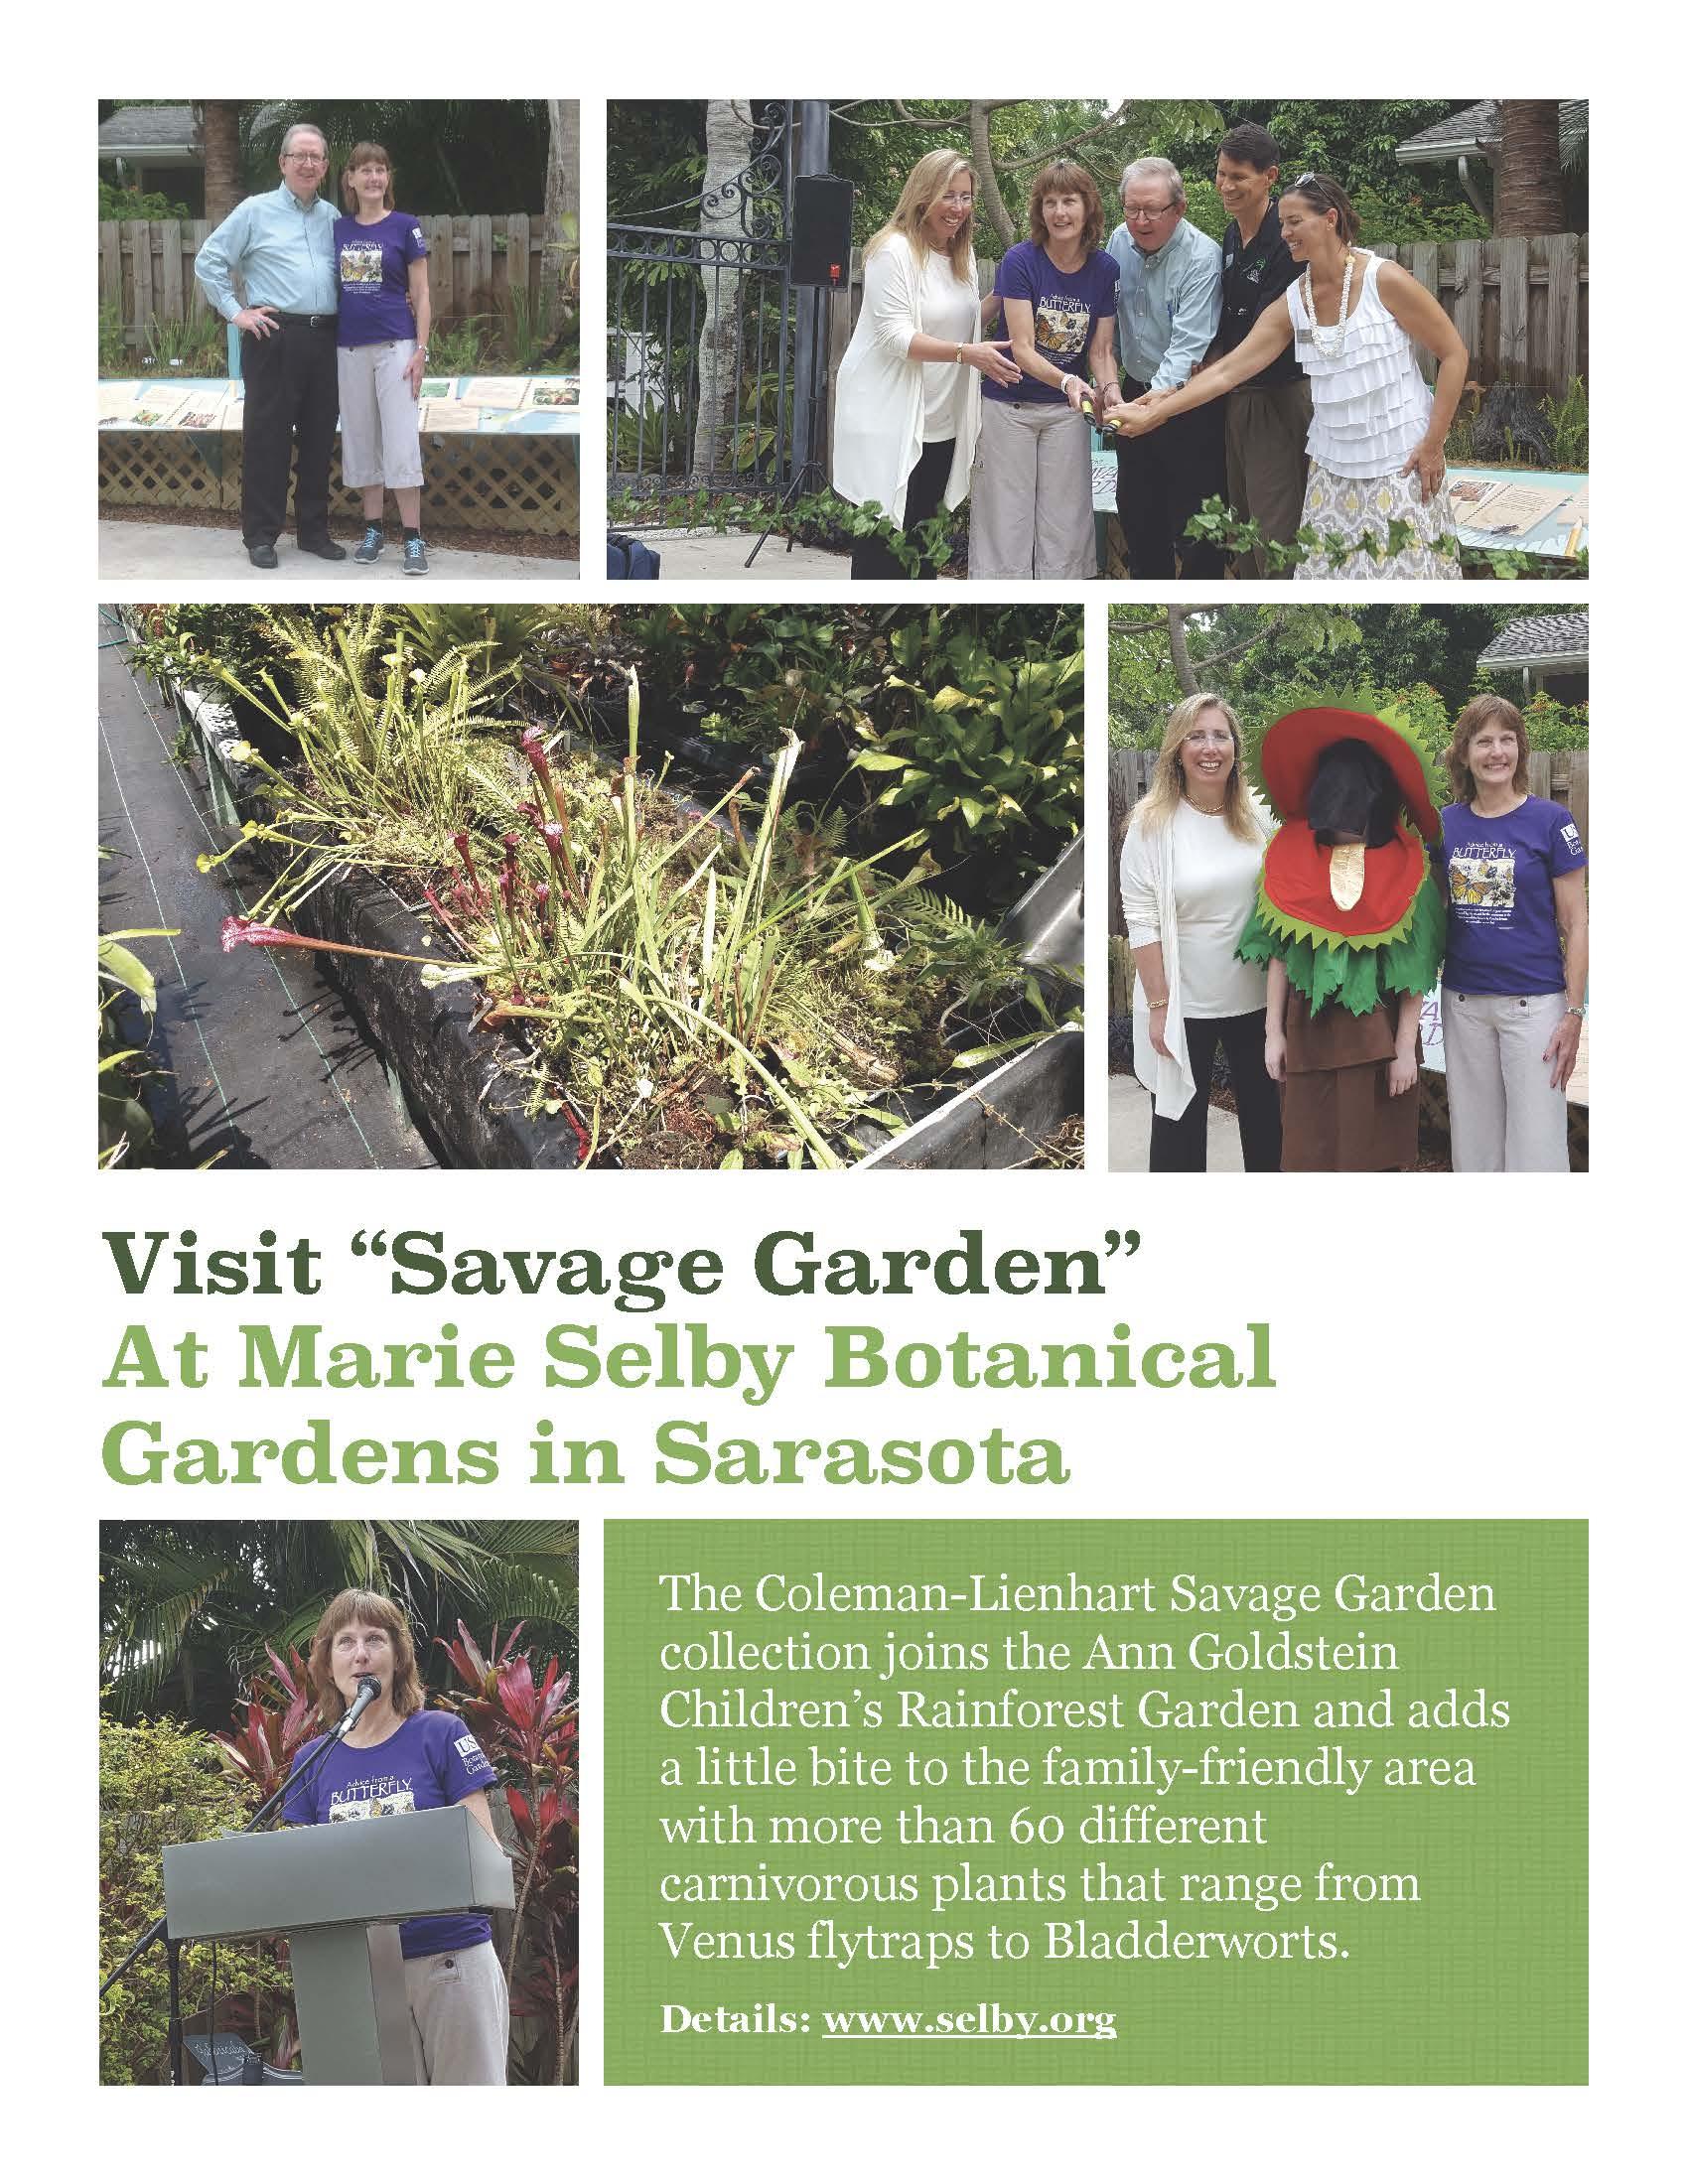 Savage Garden at Marie Selby Botanical Gardens-Sarasota